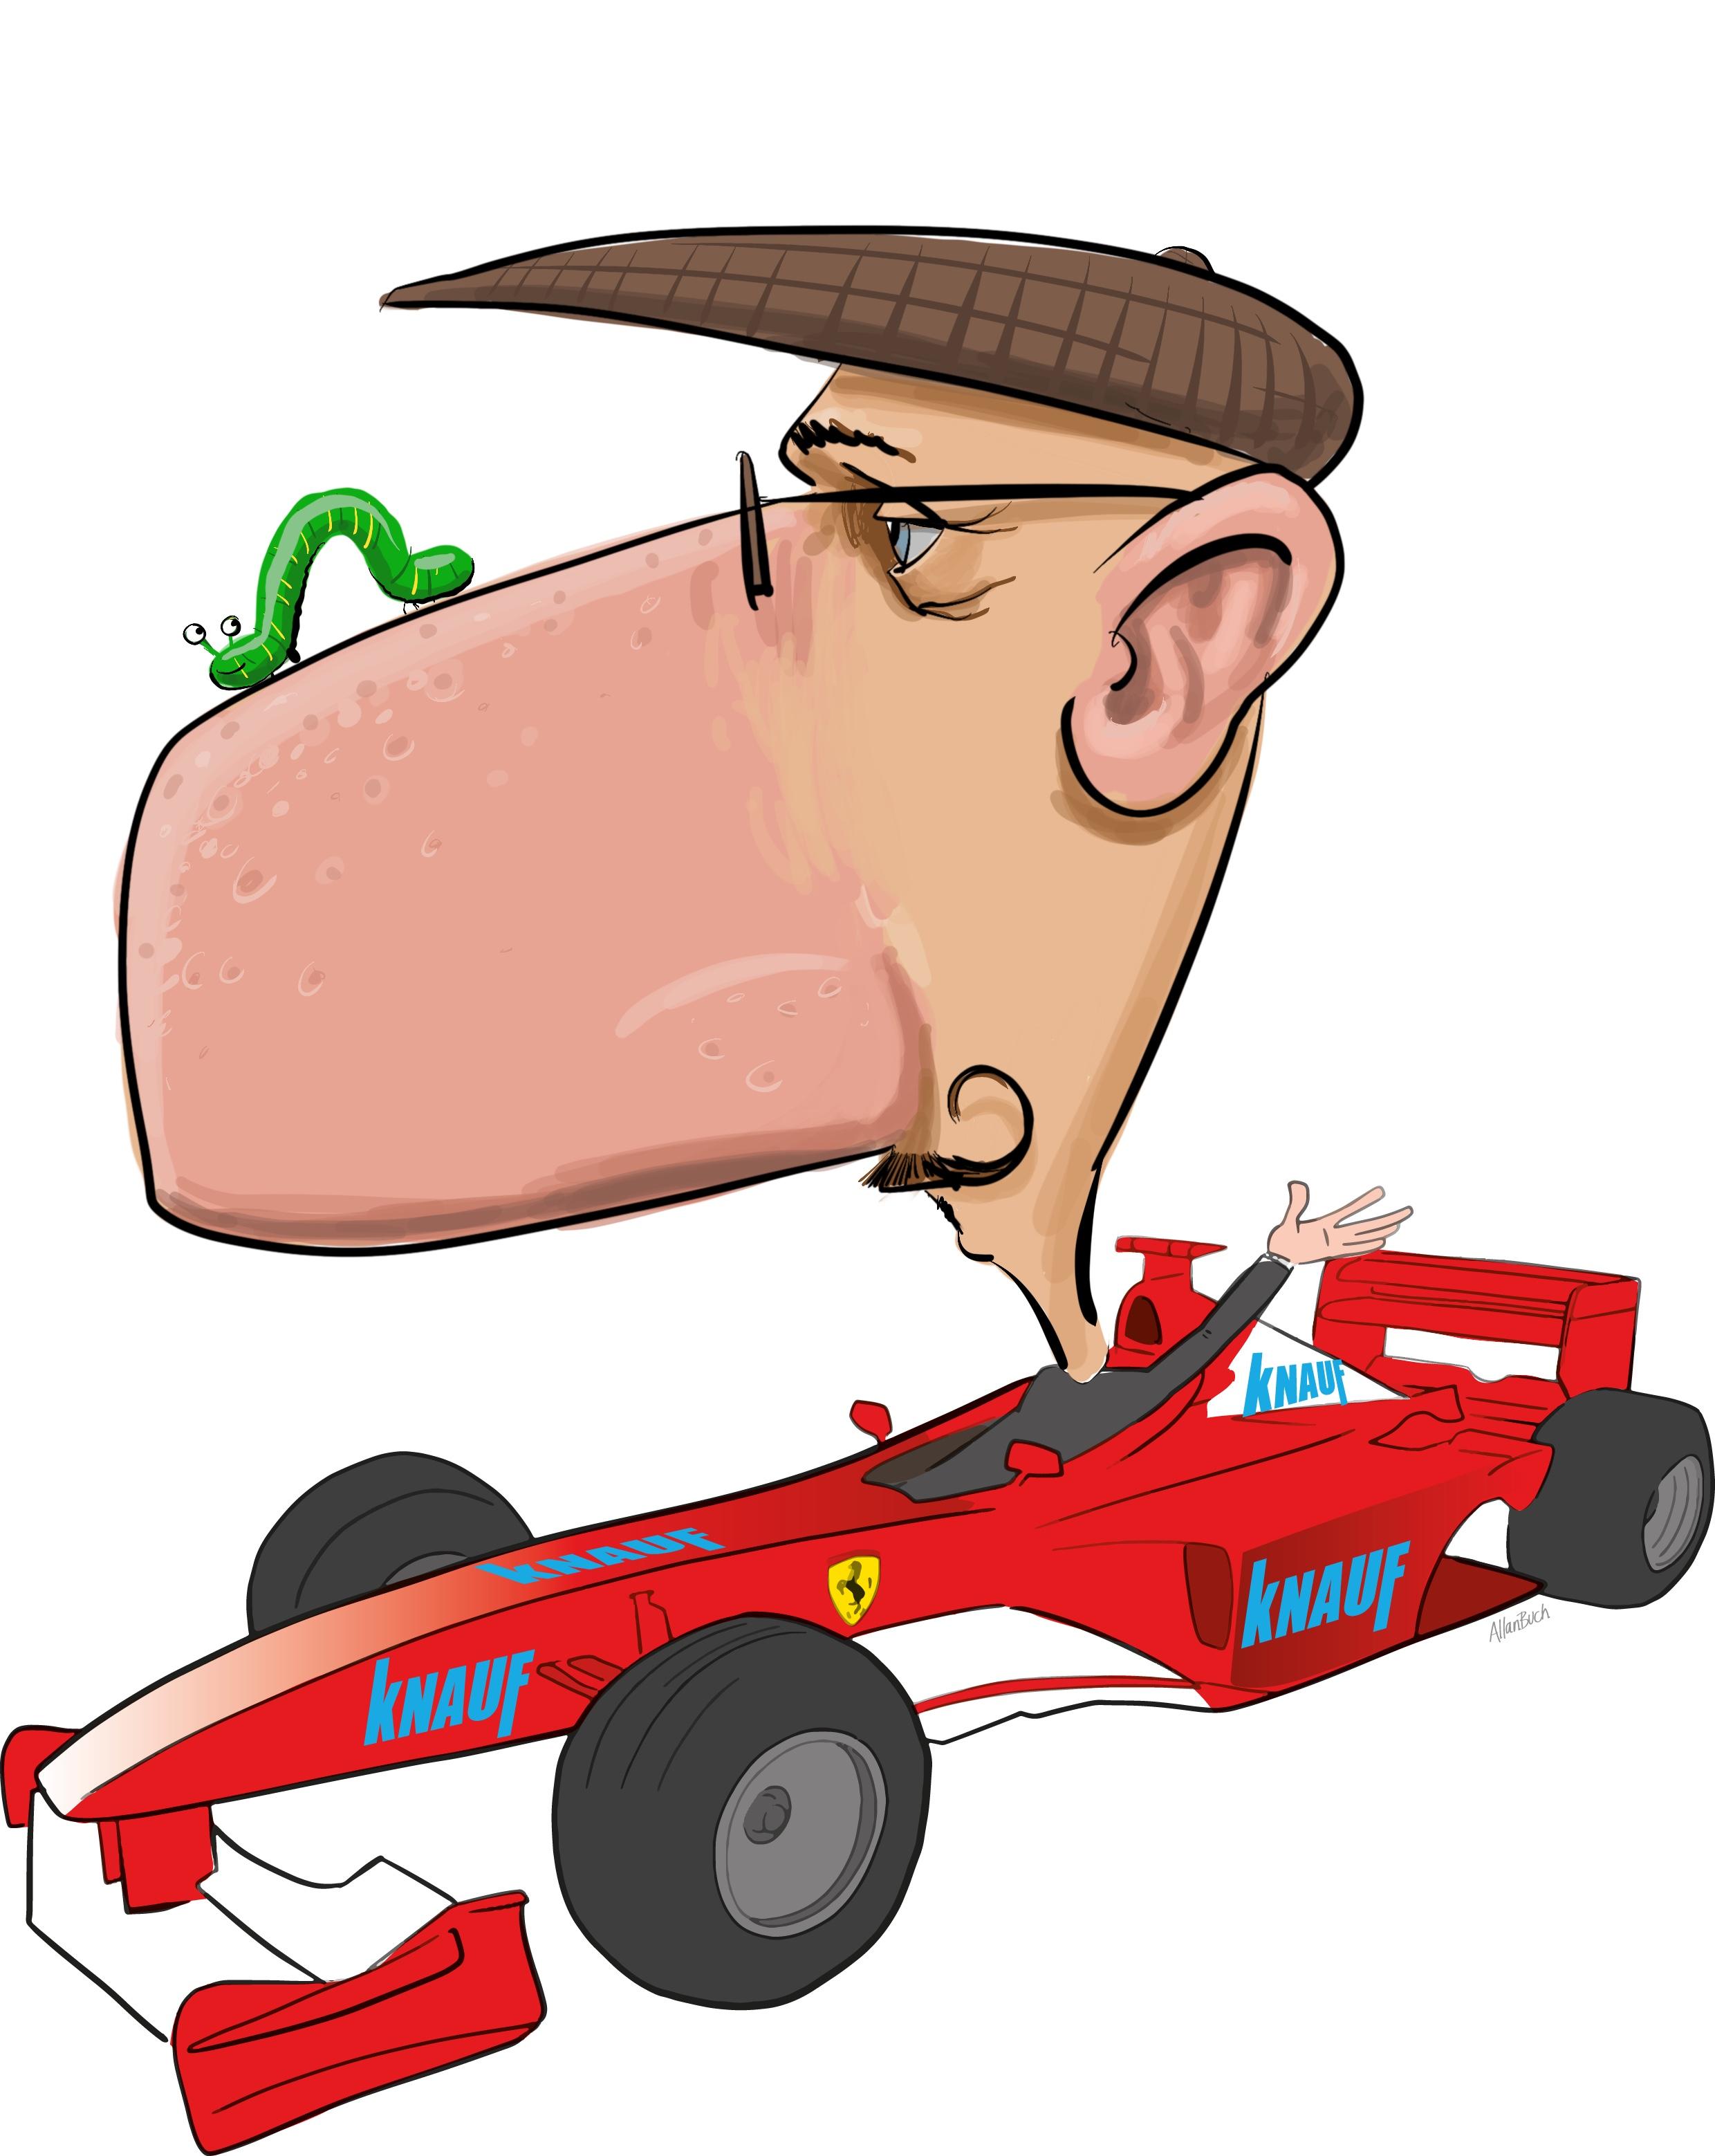 ipad Live karikatur med Allan Buch. farve profiltegning28